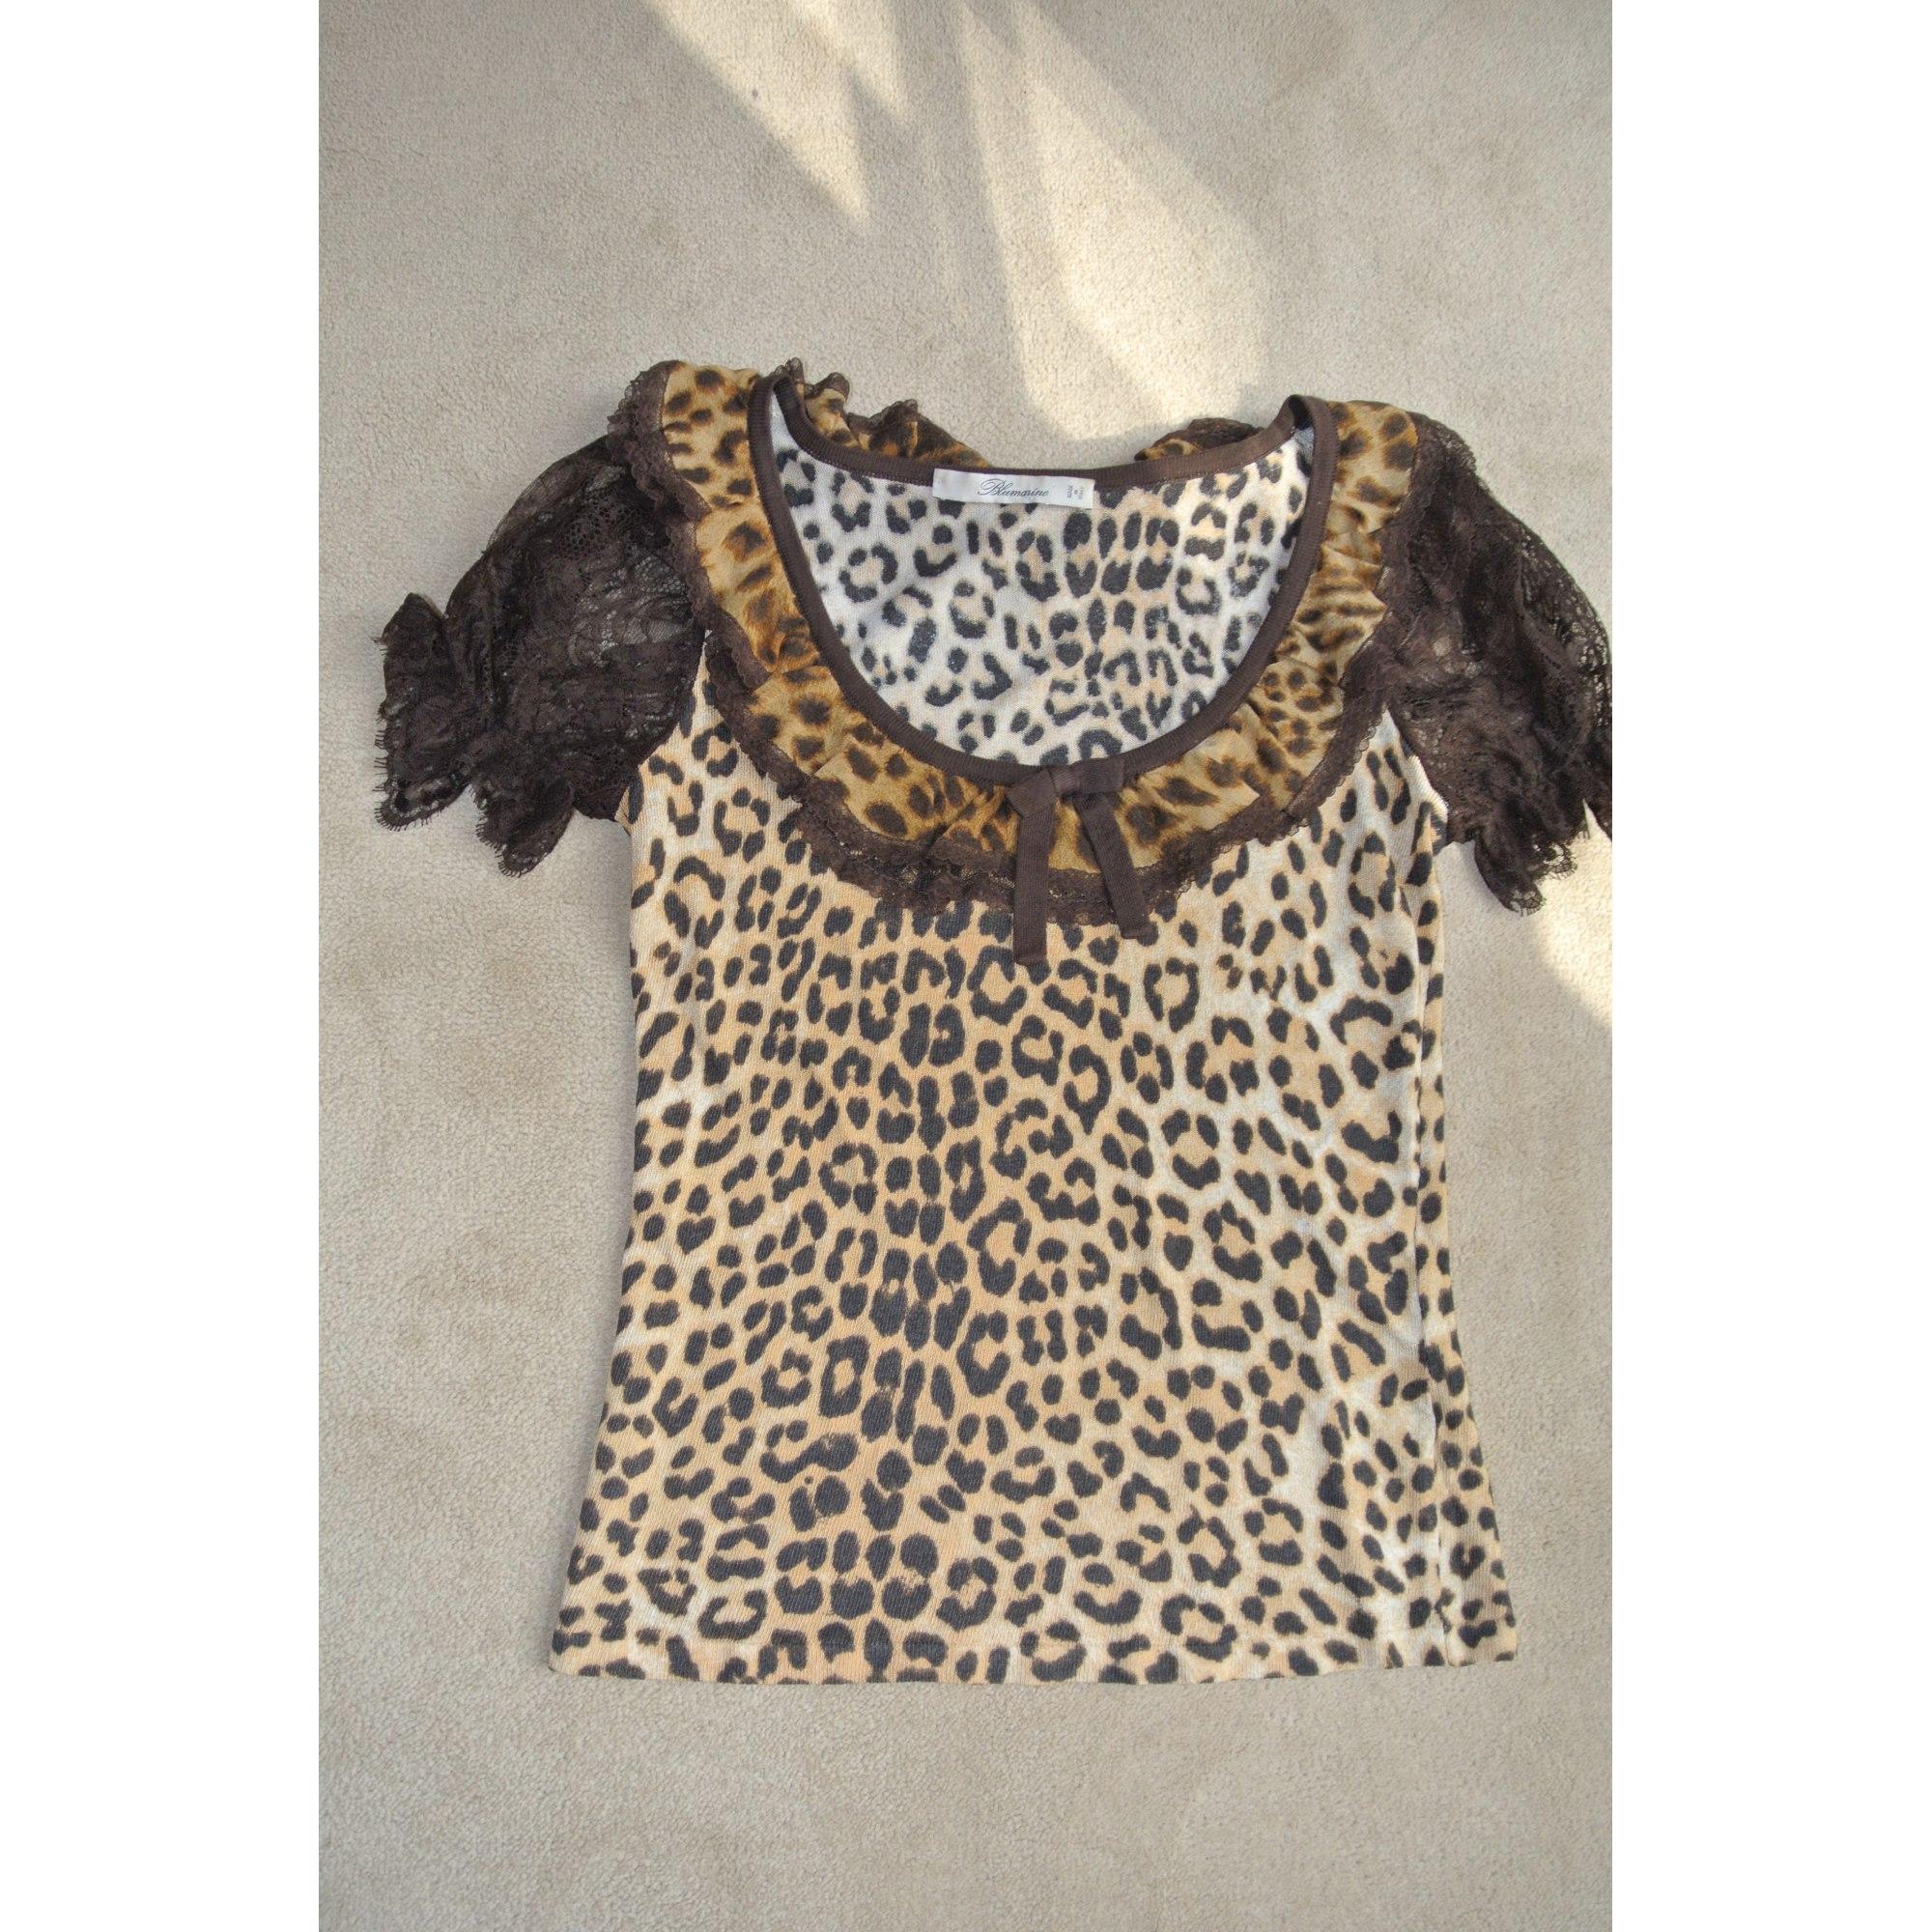 Top, tee-shirt TOP LEOPARD BLUMARINE Imprimés animaliers